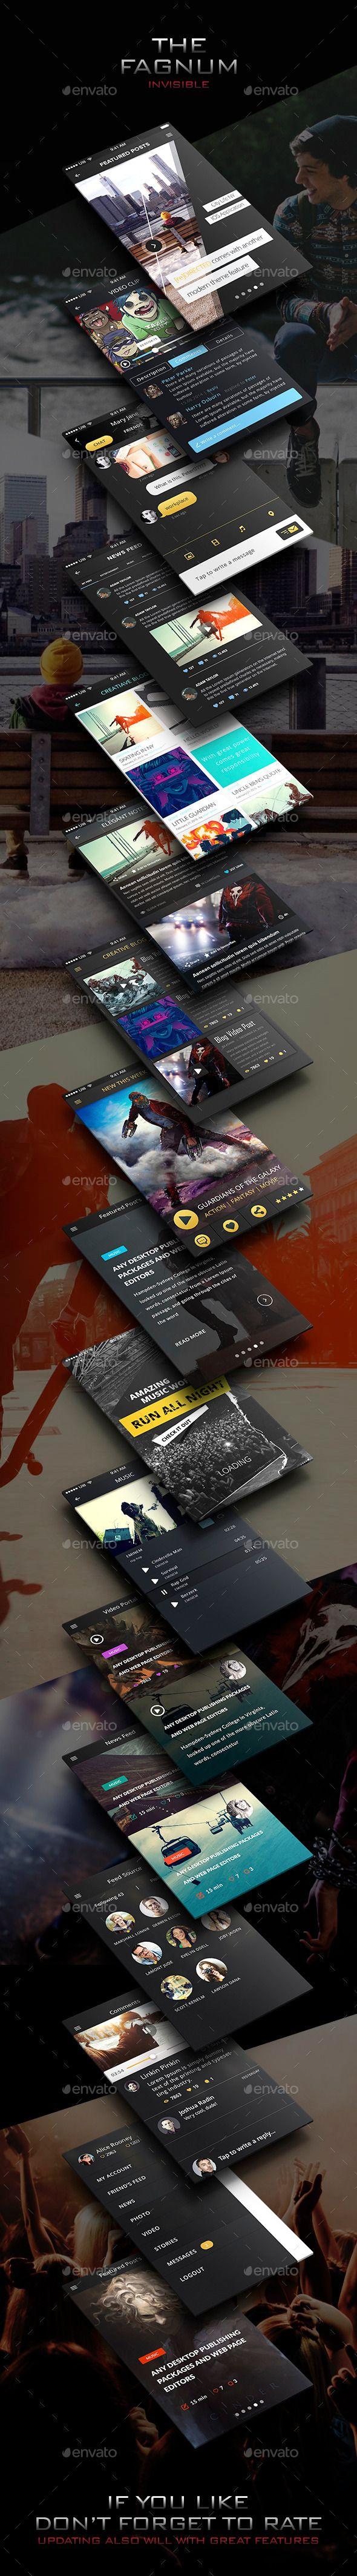 Invisible - Mobile UI Template